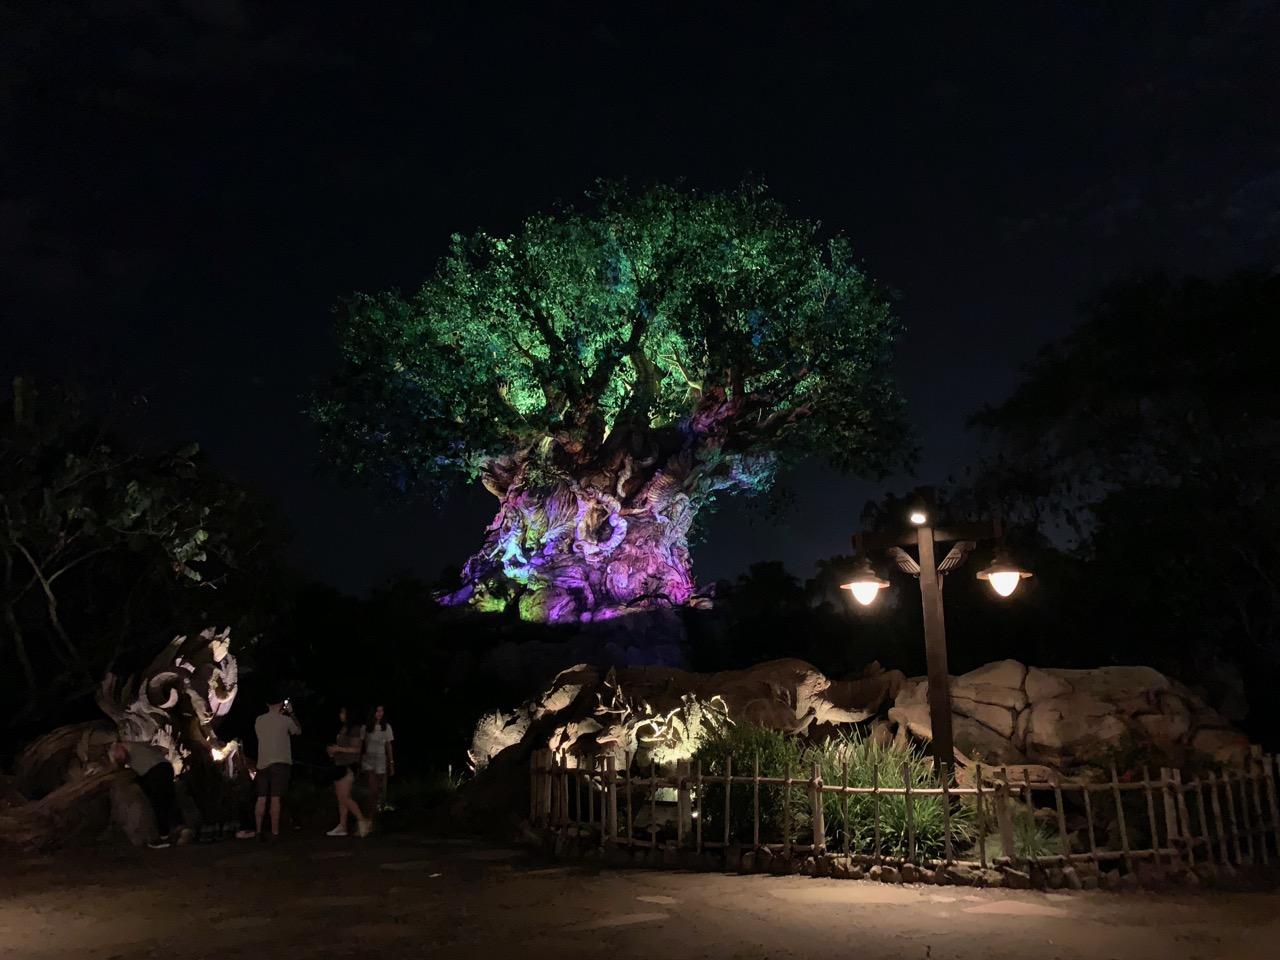 disney world animal kingdom after hours 38 tree of life.jpeg